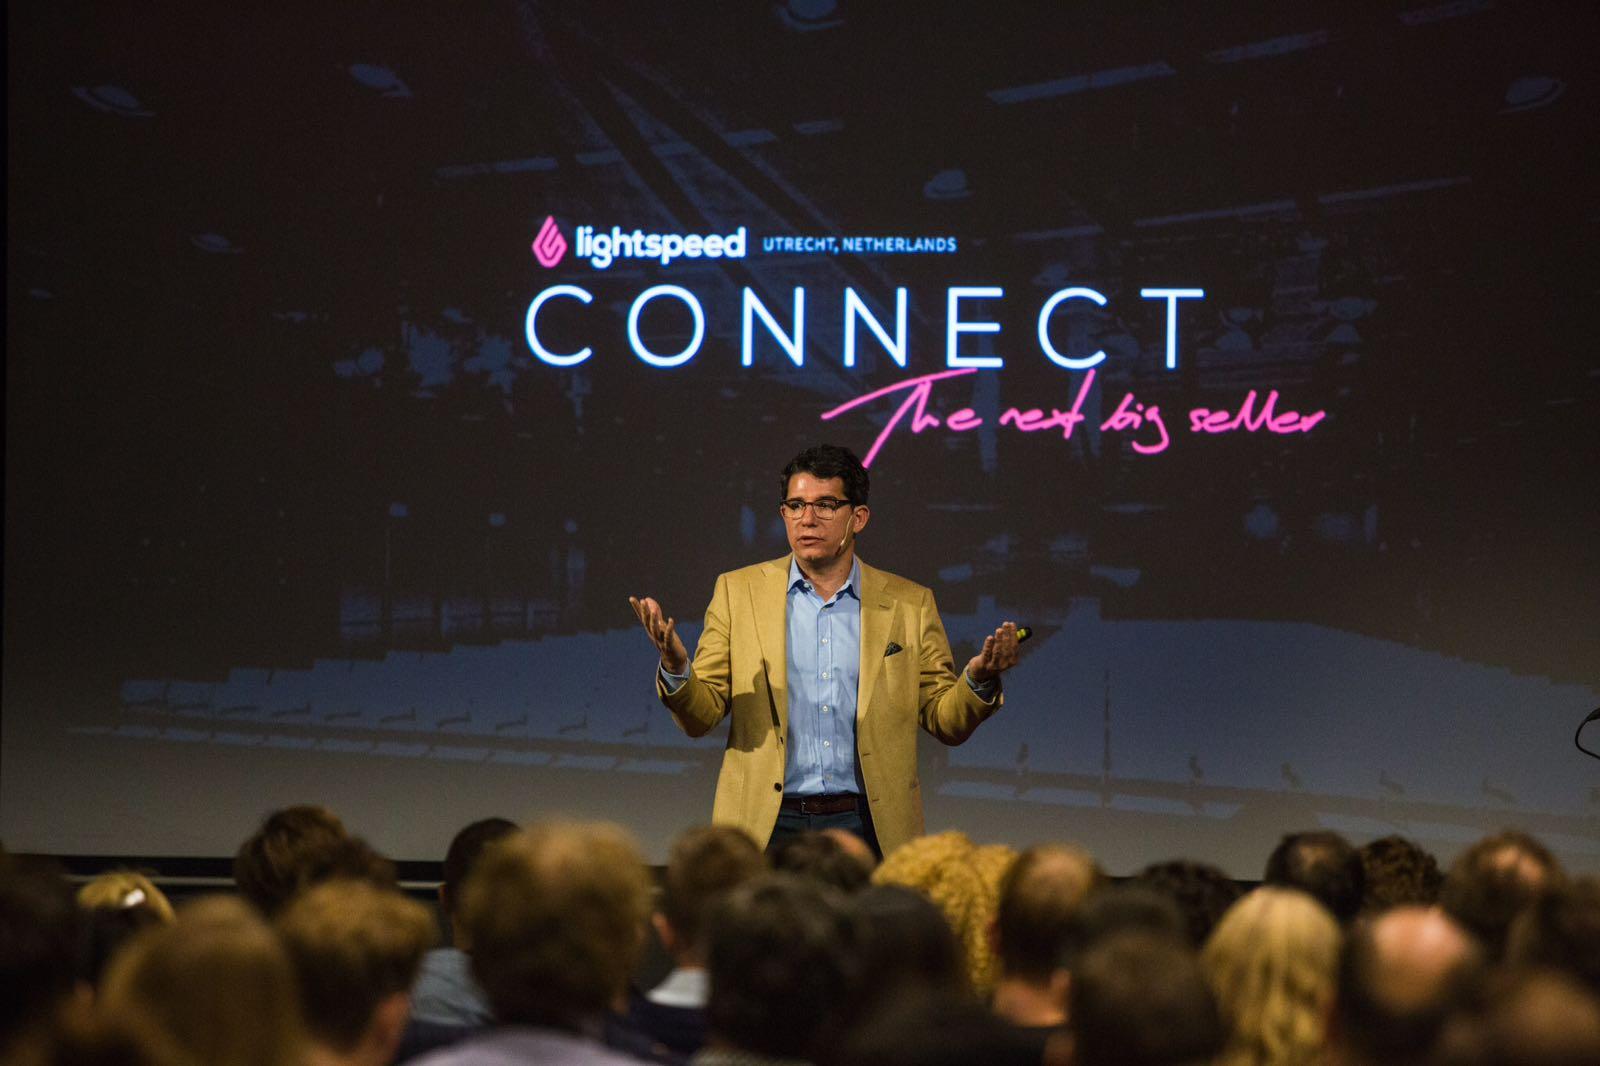 Lightspeed Connect 2016